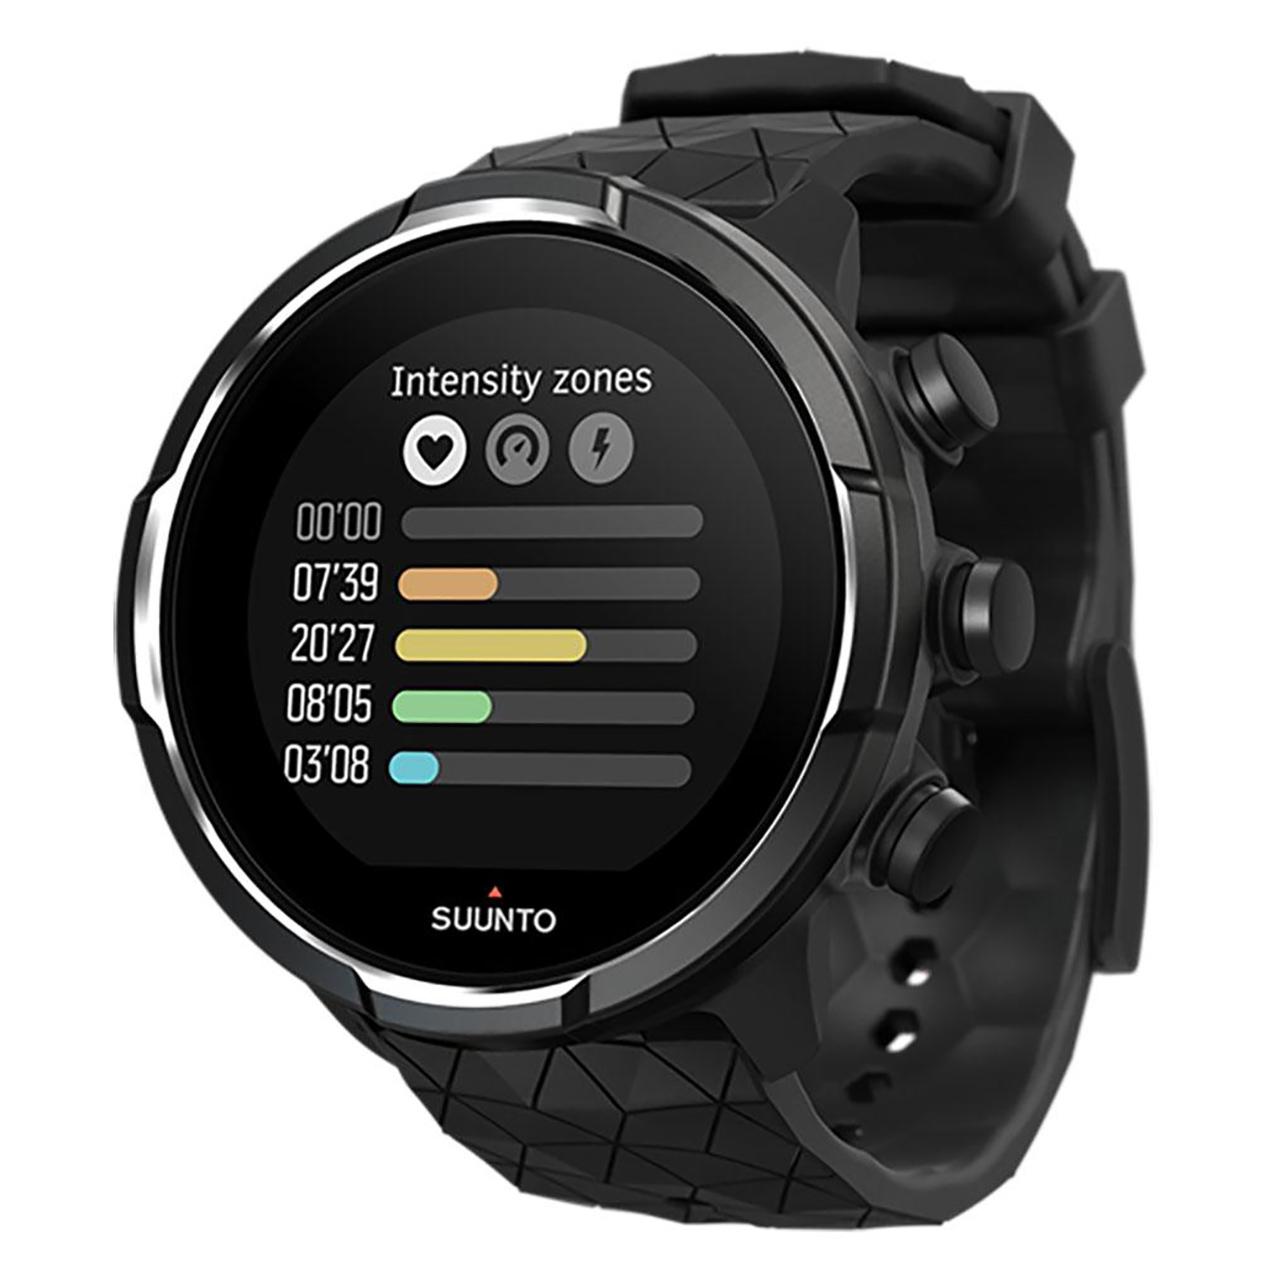 ساعت هوشمند سونتو کد SS050145000